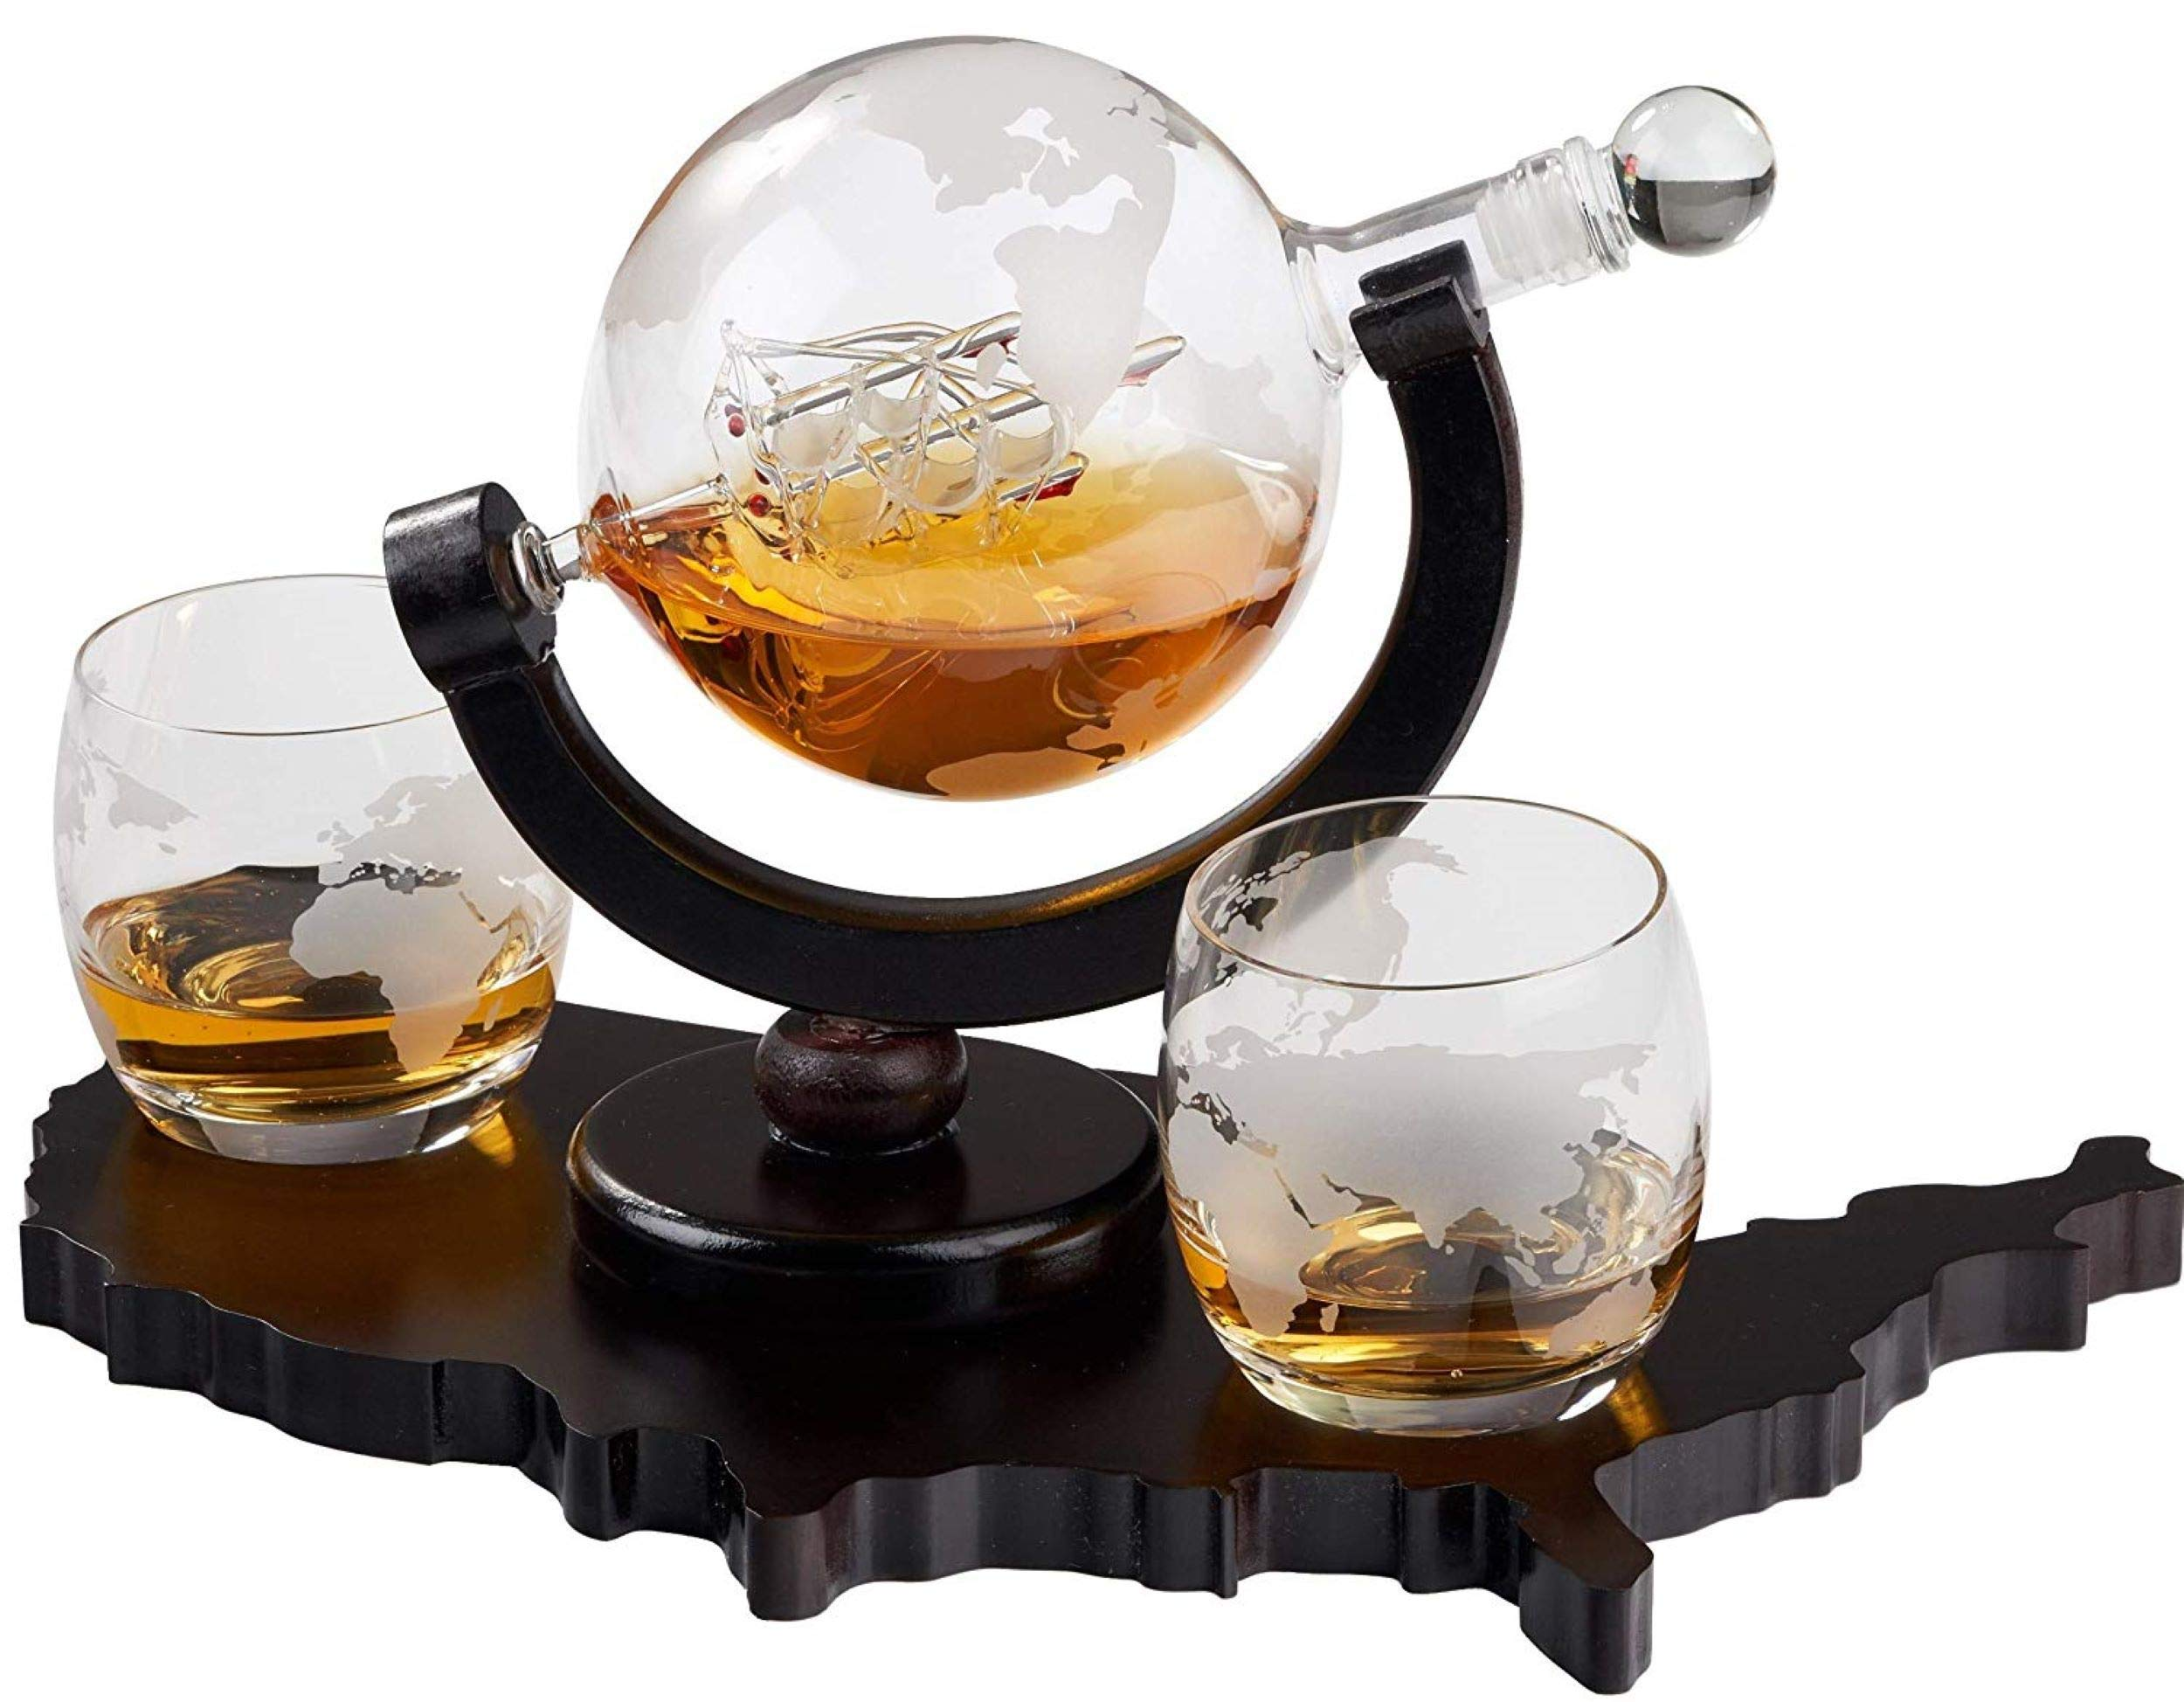 Whiskey Decanter Set World Etched Globe Decanter Airtight Stopper Antique Ship Liquor Dispenser Perfect Bar Gift Bourbon Scotch Vodka Liquor USA Map Tray 850 ml by Bezrat